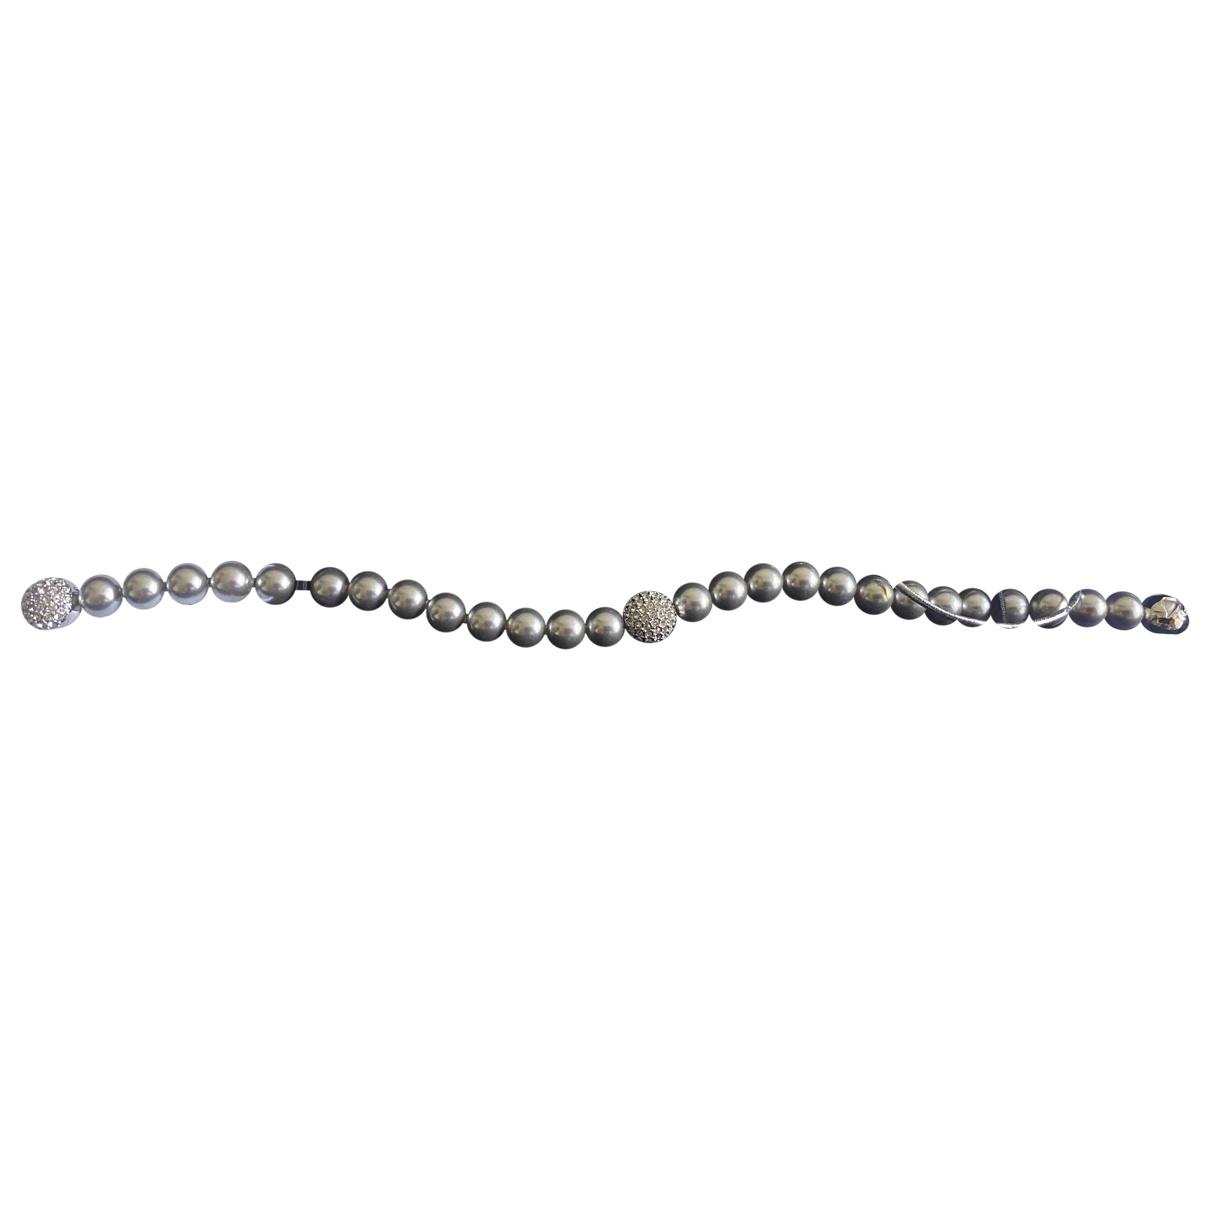 Swarovski \N Armband in  Grau Perlen